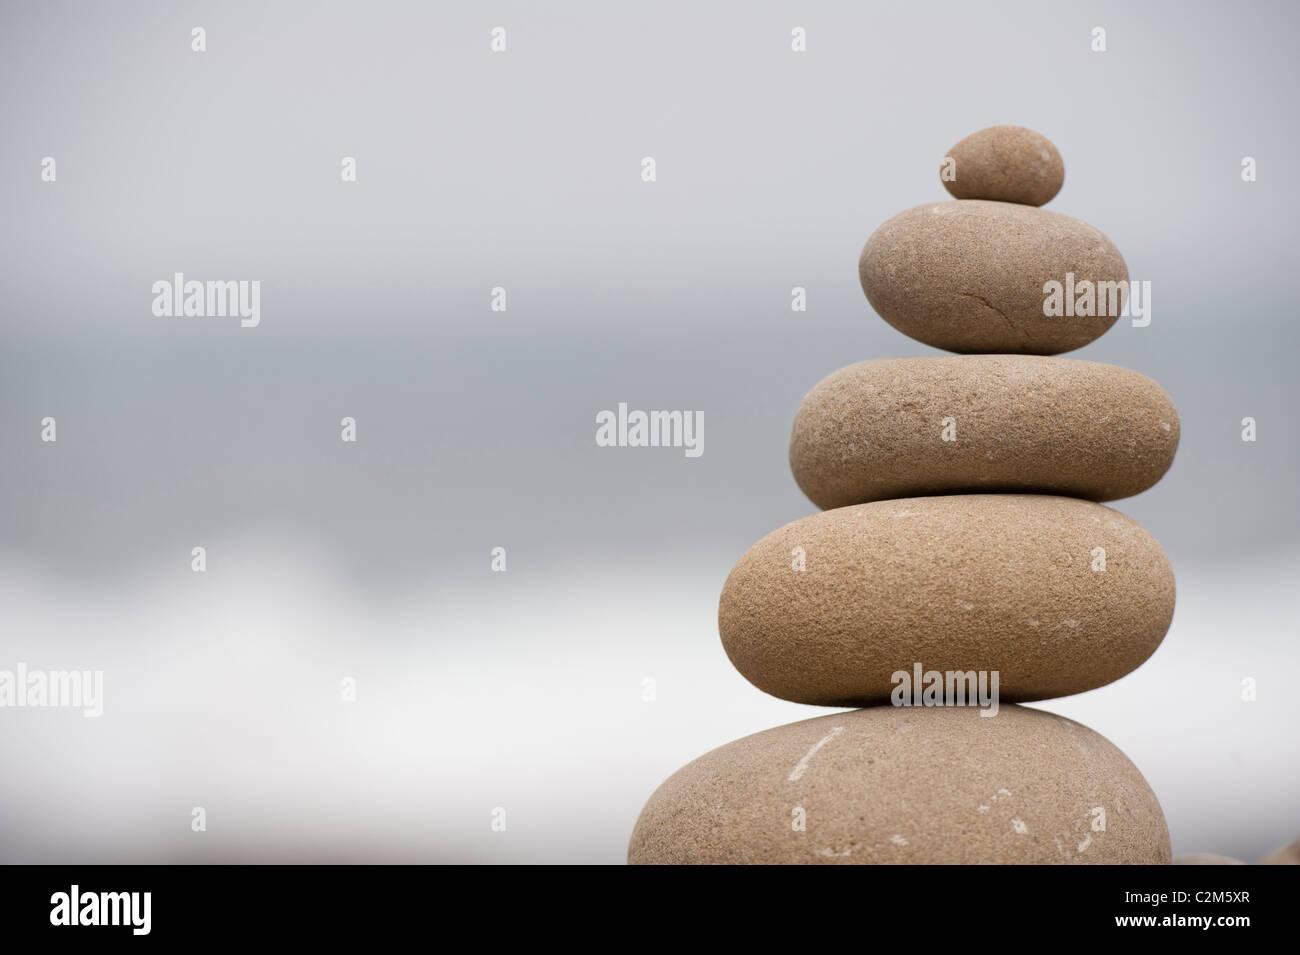 pile of balanced rocks against ocean background - Stock Image